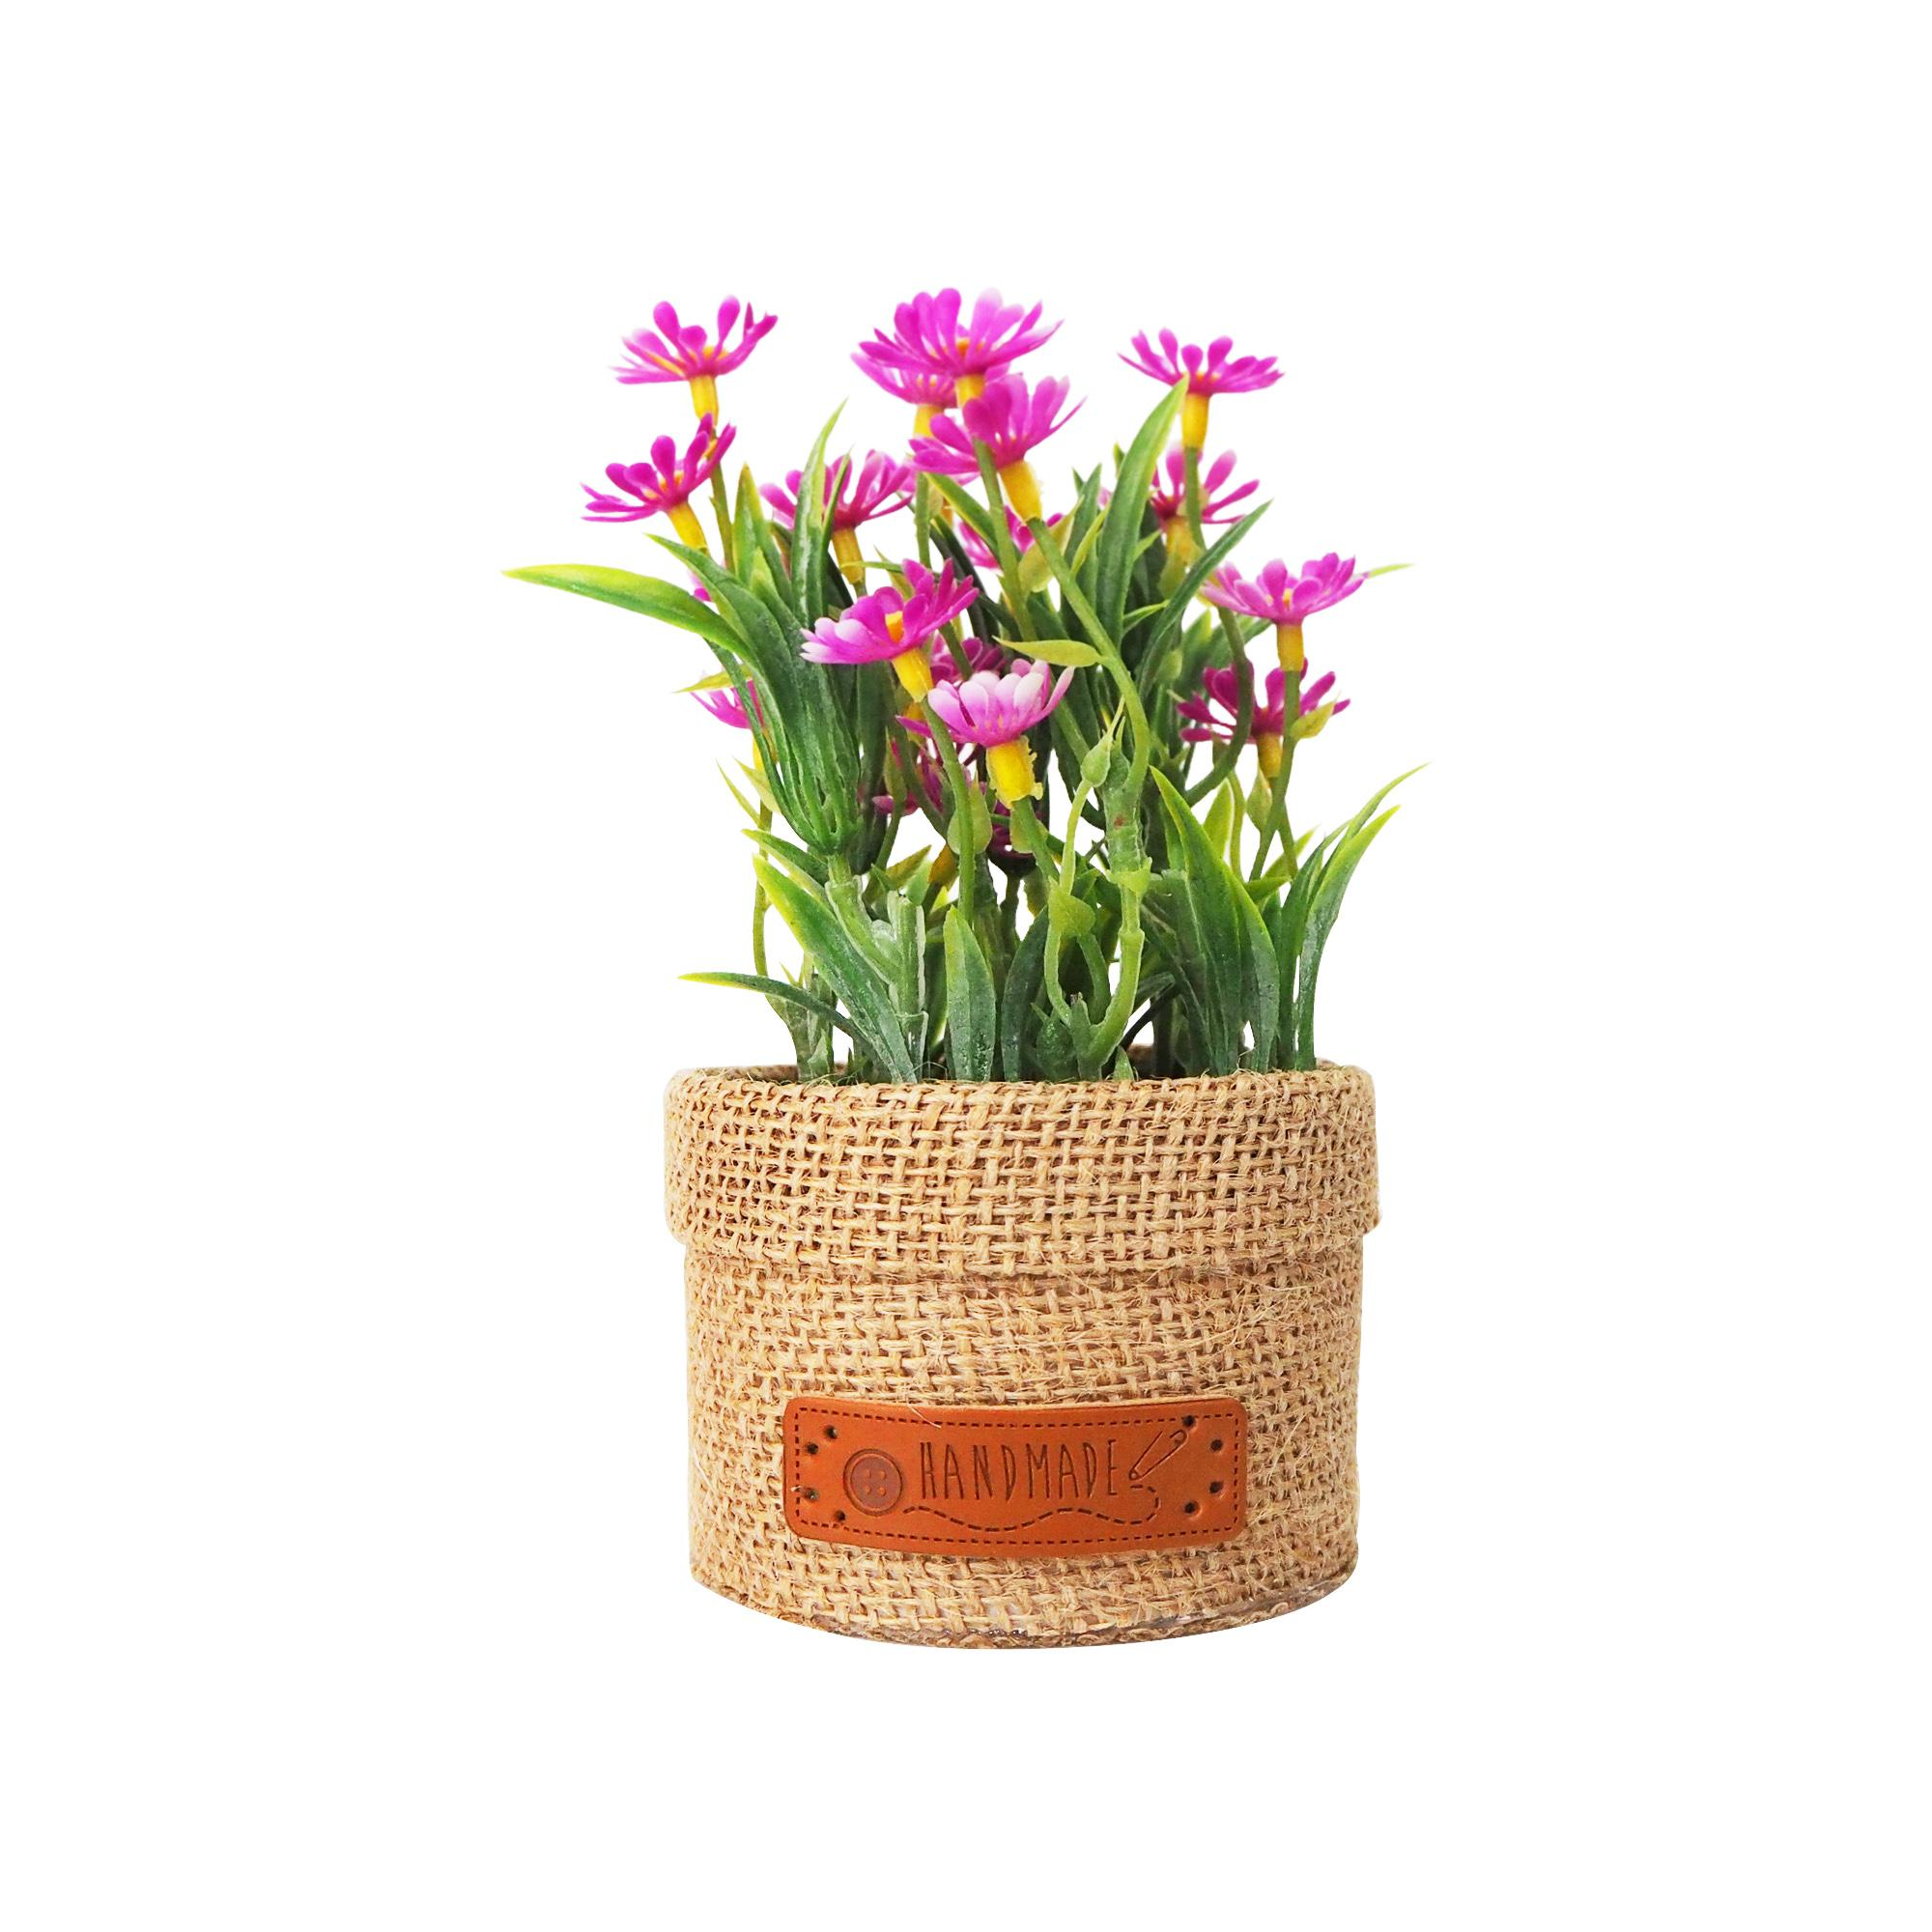 MENDEKOR Jior Pink |vas pot bunga artificial hiasan dekor interior unik shabby